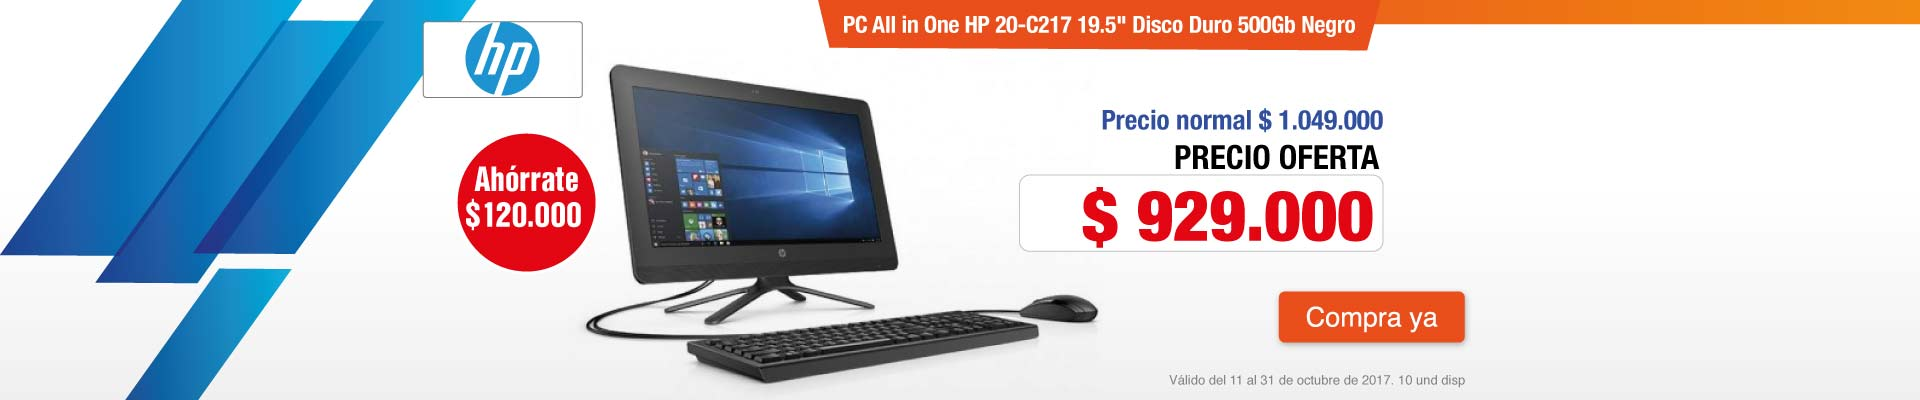 PPAL AK-5-computadores-PC All in One HP 20-C217 Intel Celeron 19.5